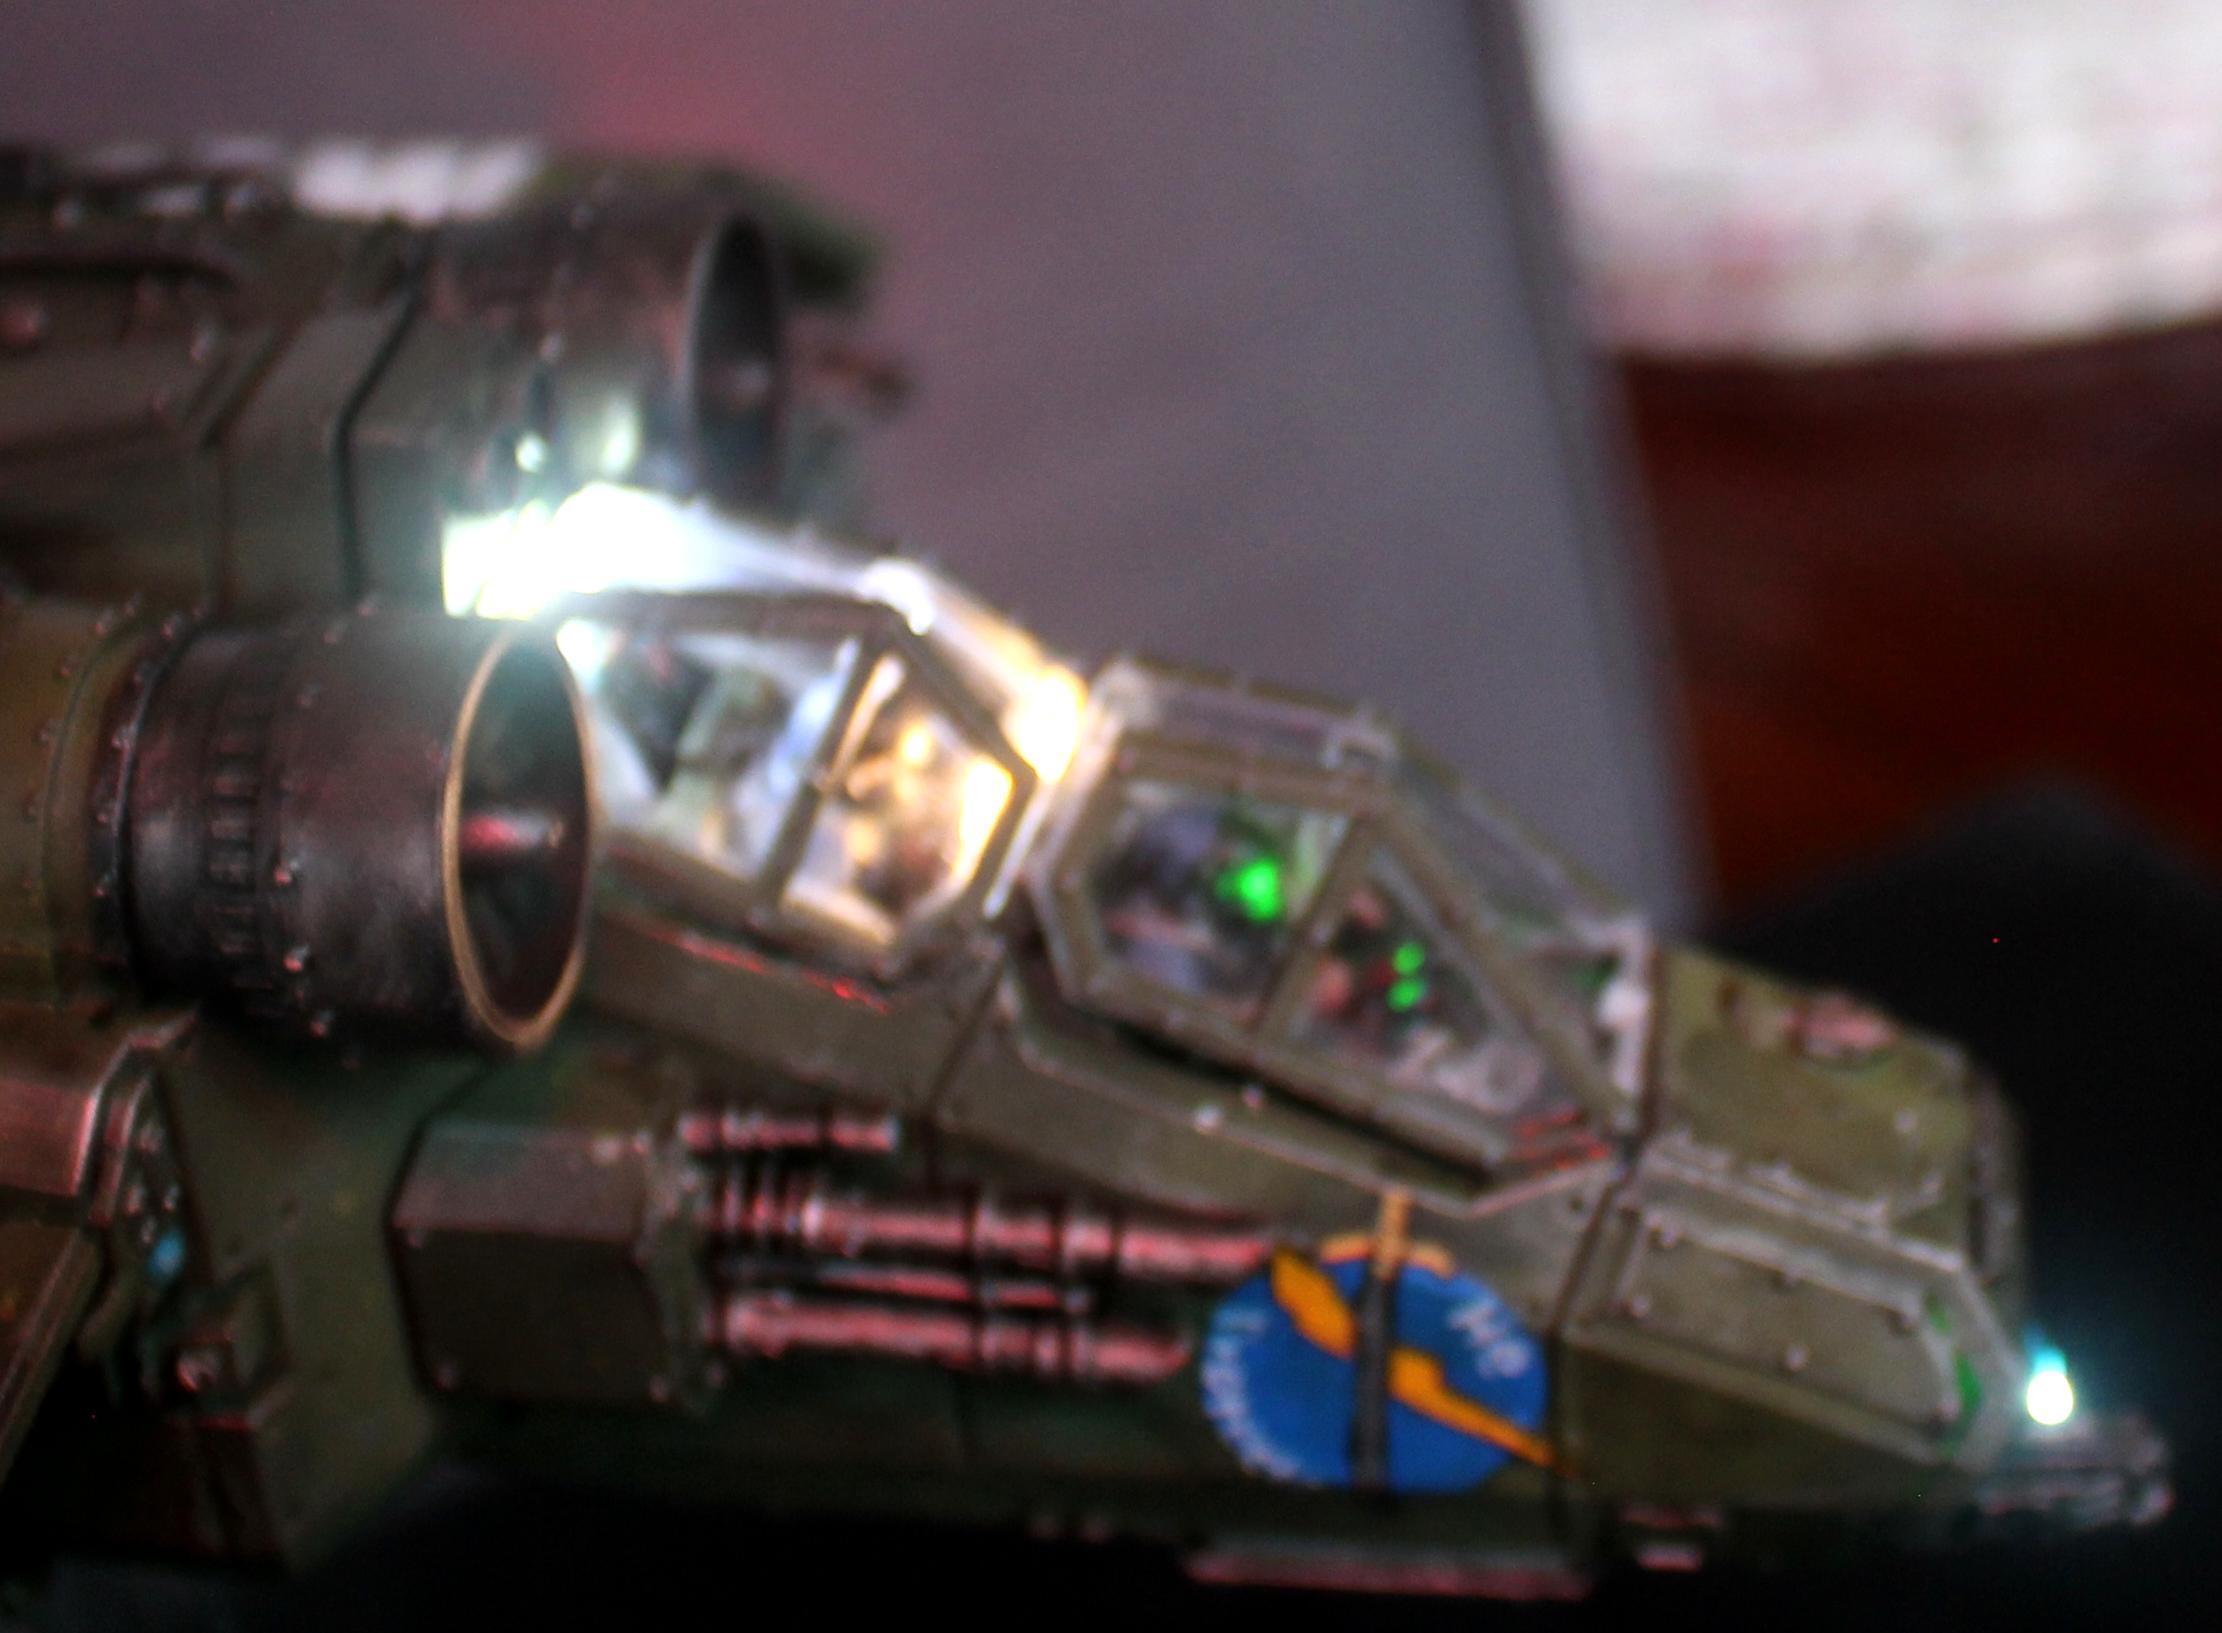 Forge World, Games Workshop, LED, Lights, Valkyrie, Vendetta, Warhammer 40,000, Wired